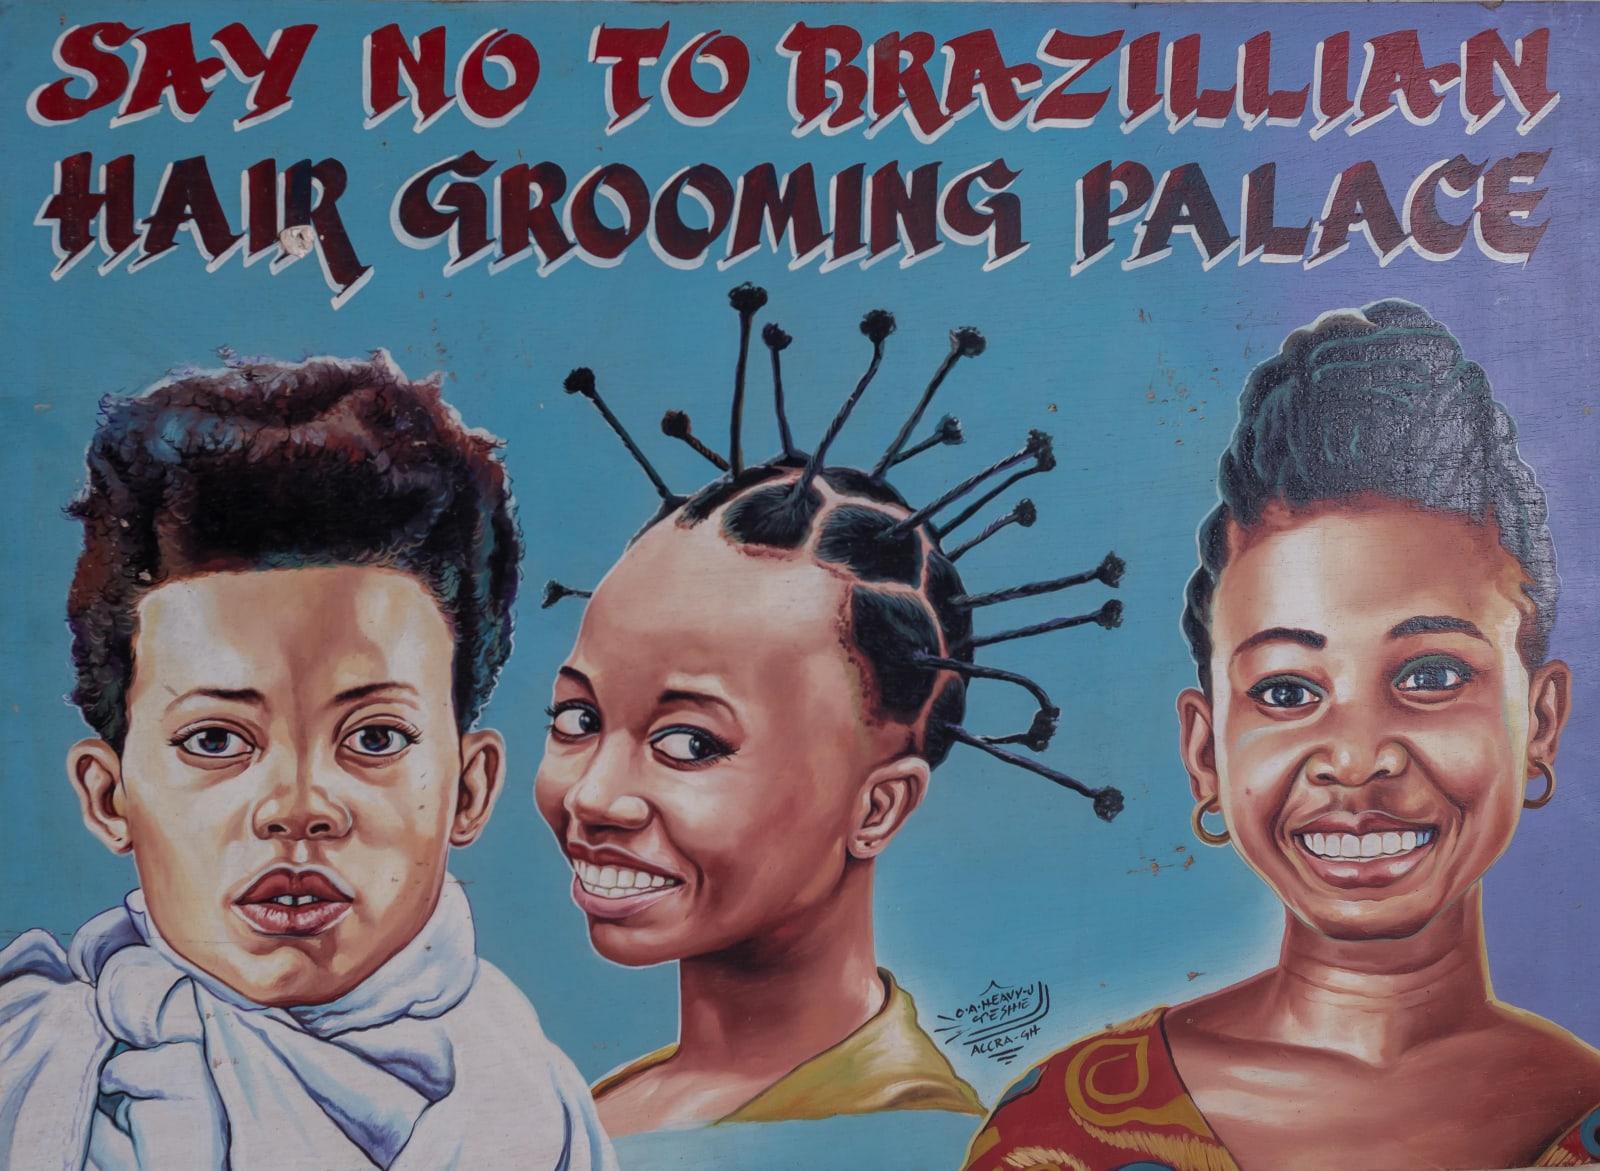 Say No to Brazilian Hair Grooming Palace 61.5 x 84 cm